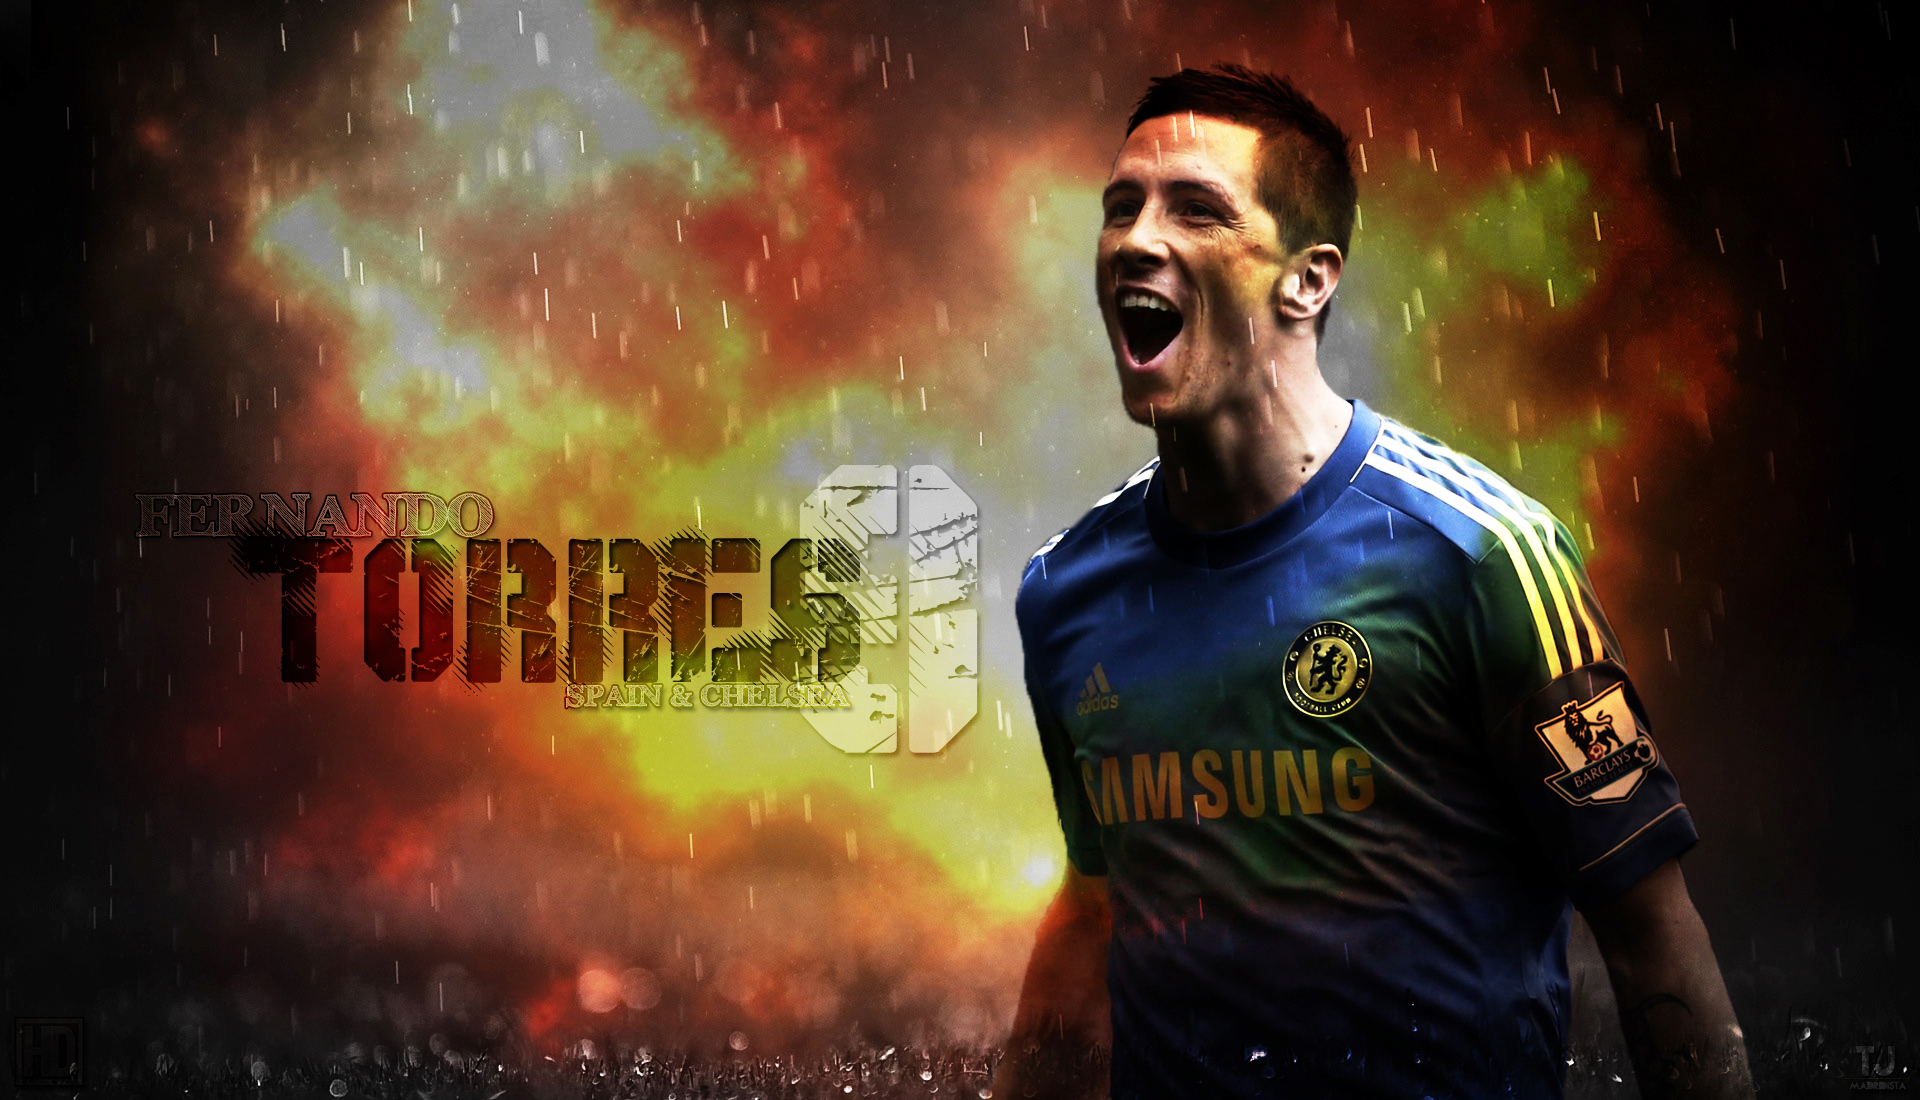 Fernando Torres Celebration Wallpaper   Football HD Wallpapers 1920x1100